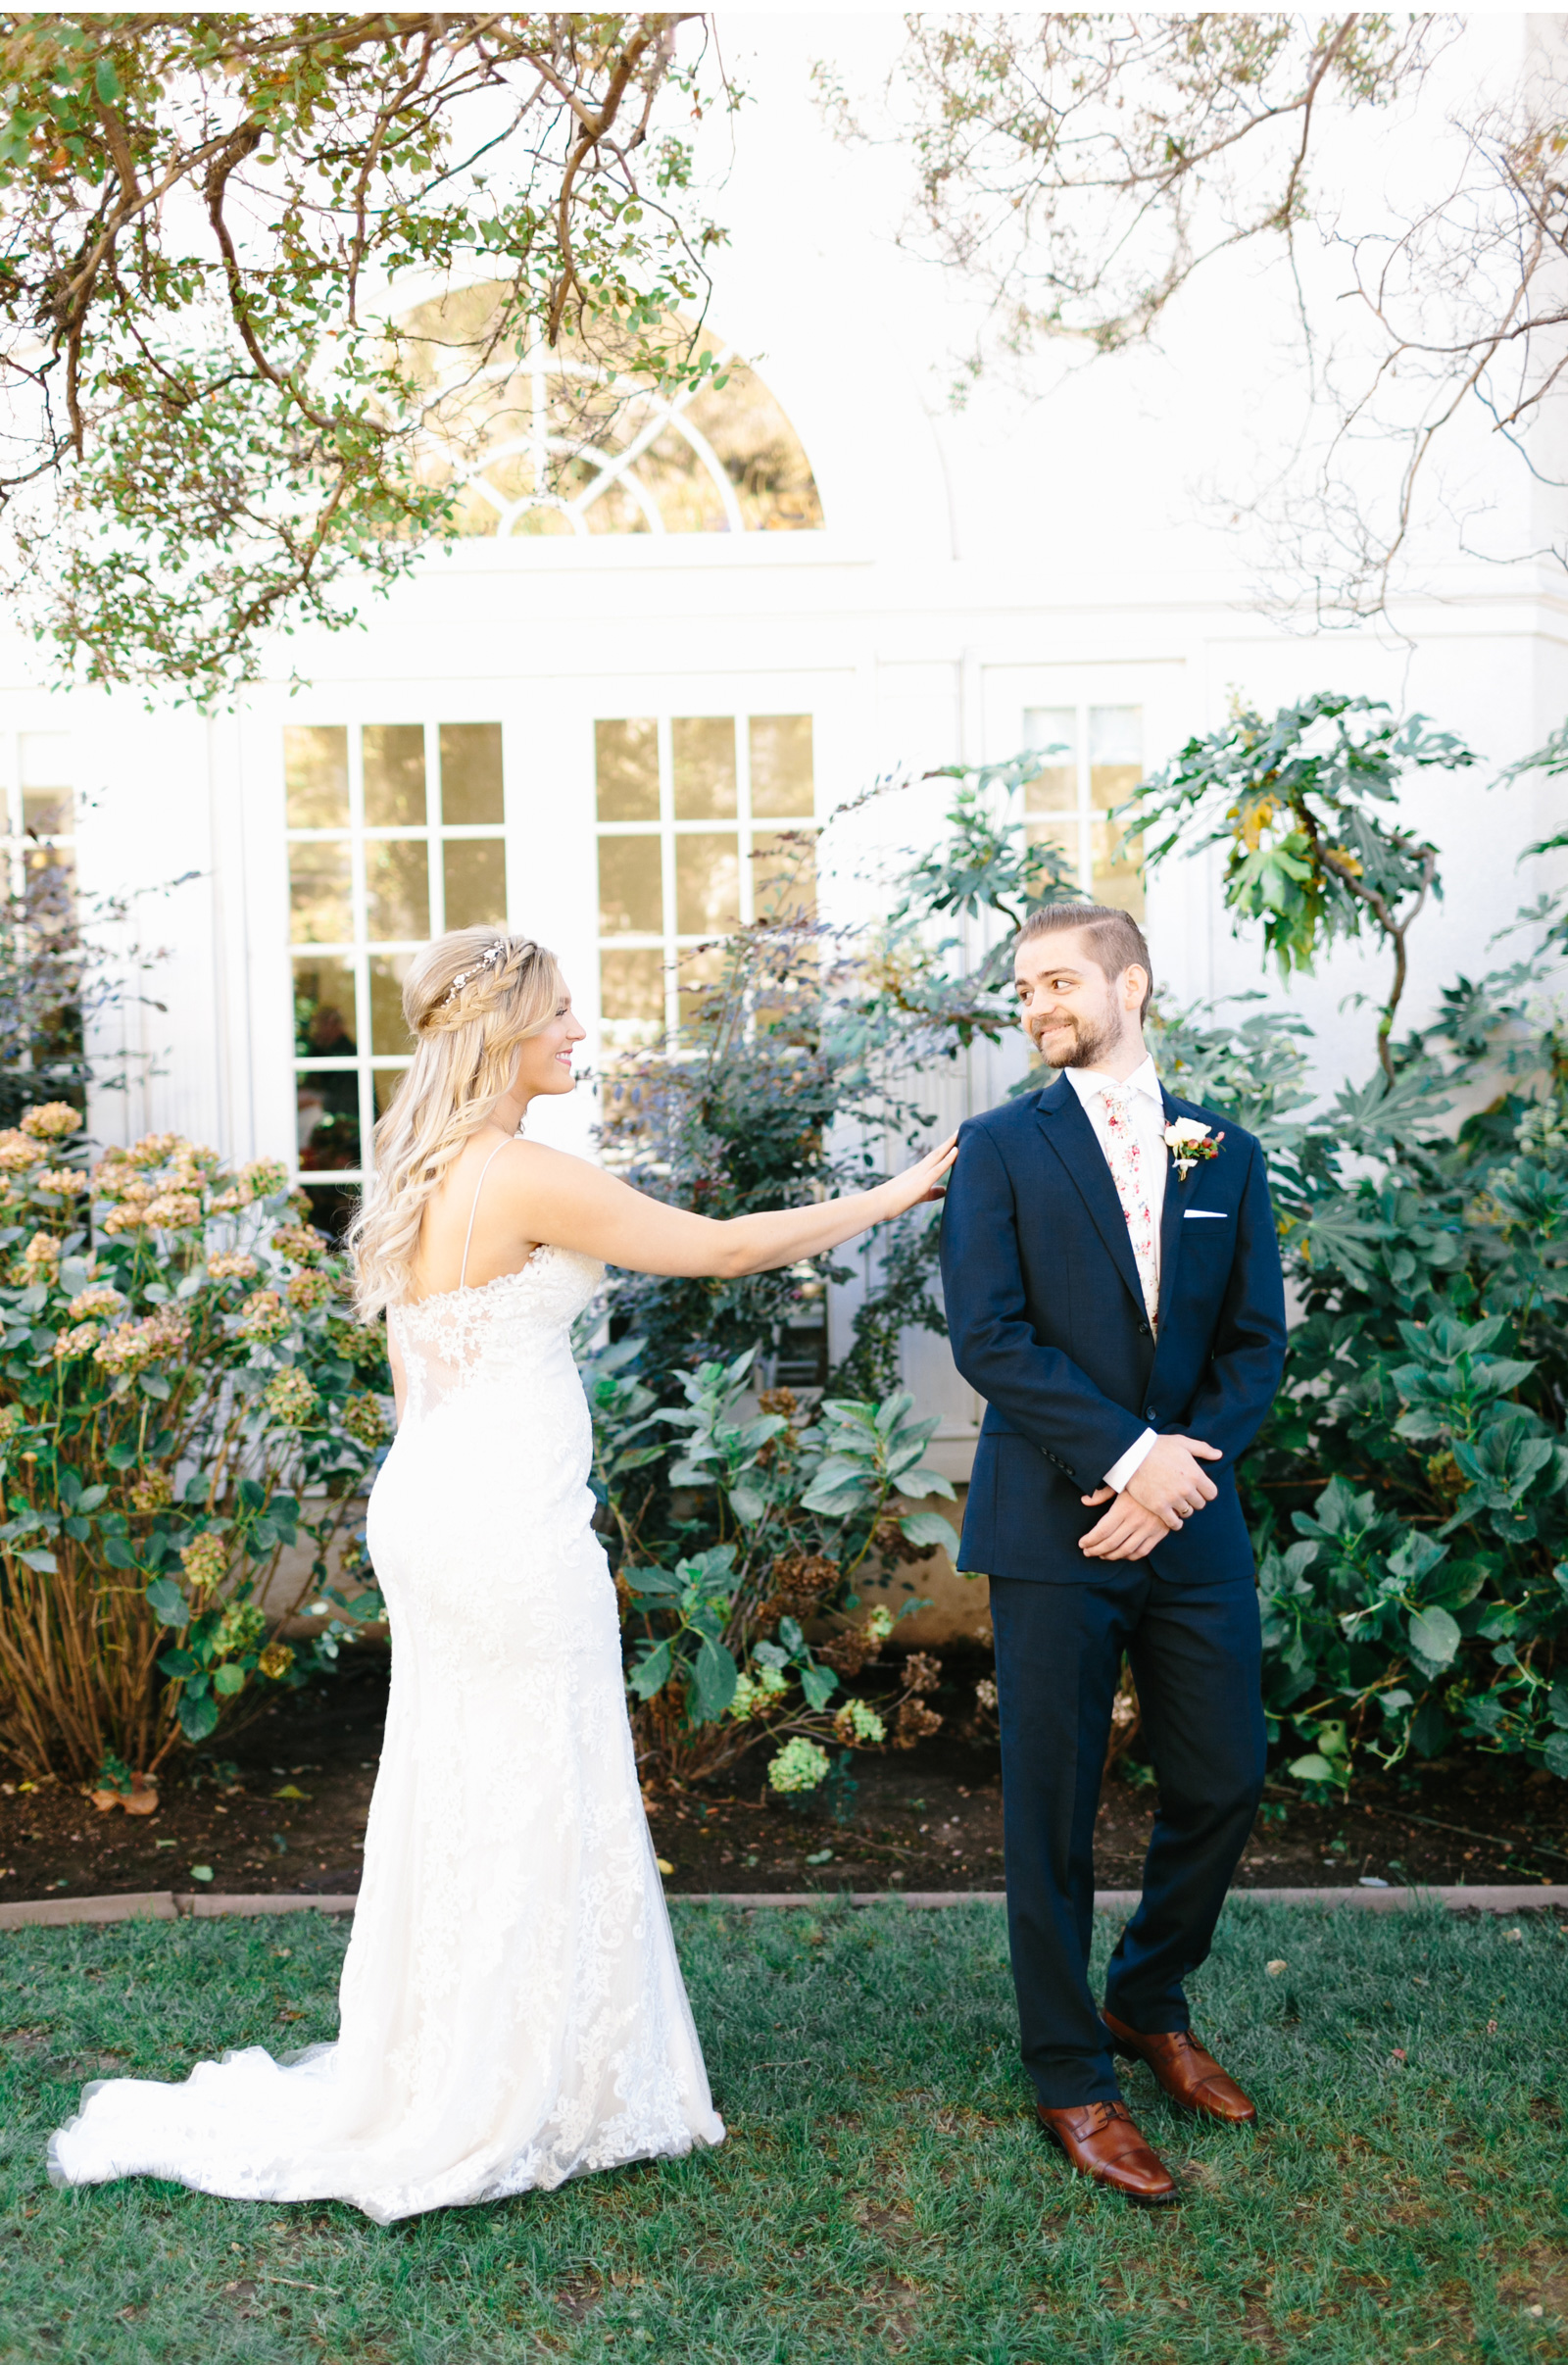 Malibu-Wedding-Photographer-Natalie-Schutt-Photography-Vizcaya_09.jpg